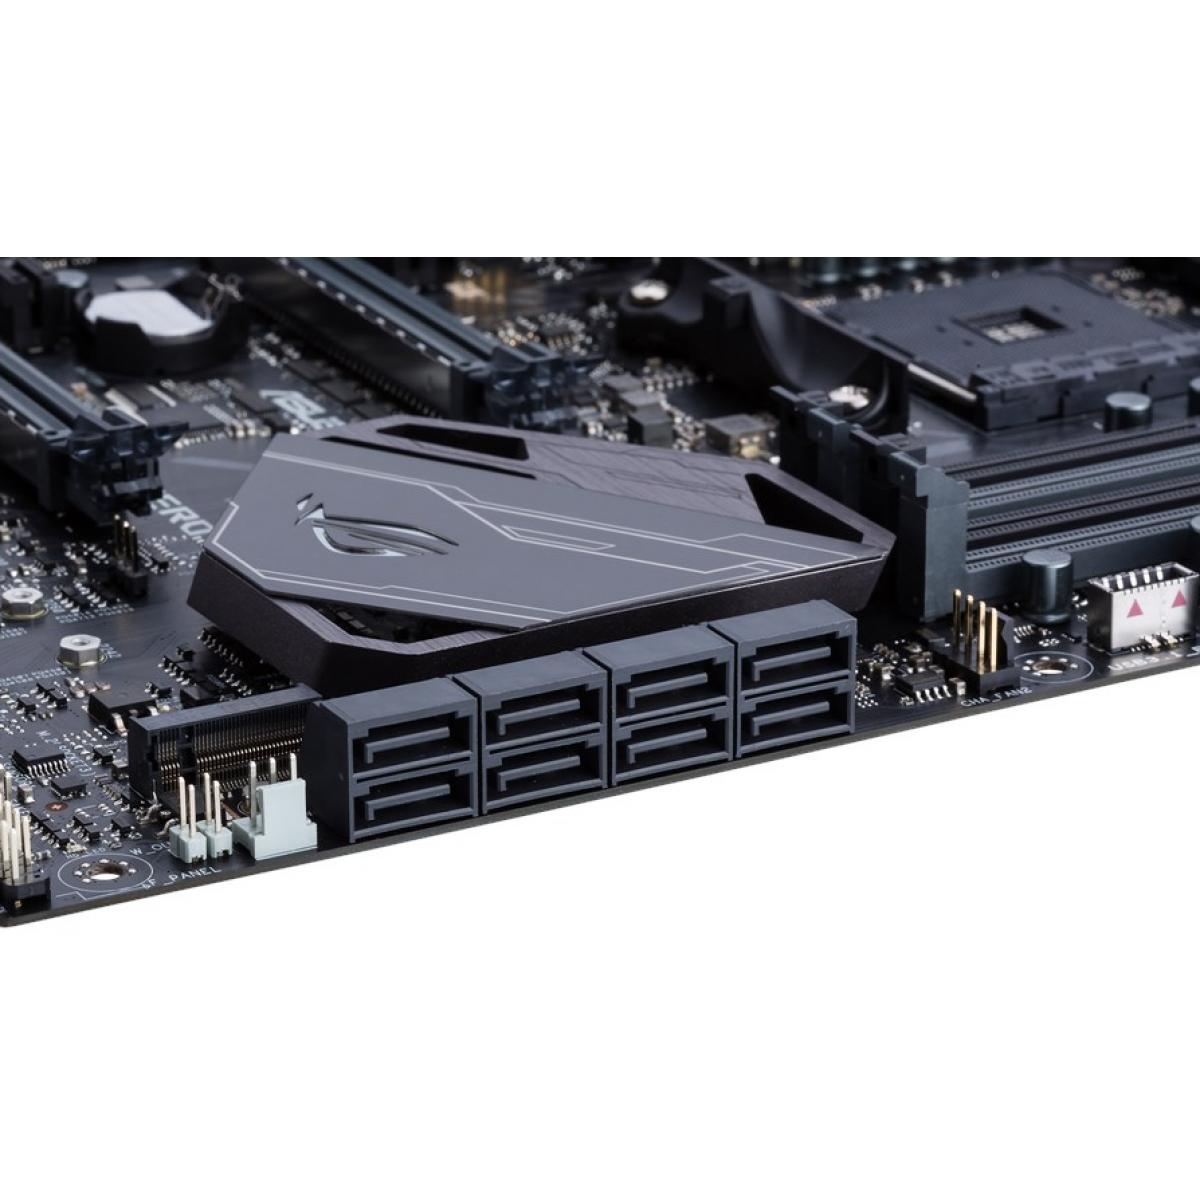 Placa Mãe Asus ROG Crosshair VI Hero, Chipset X370, AMD AM4, ATX, DDR4